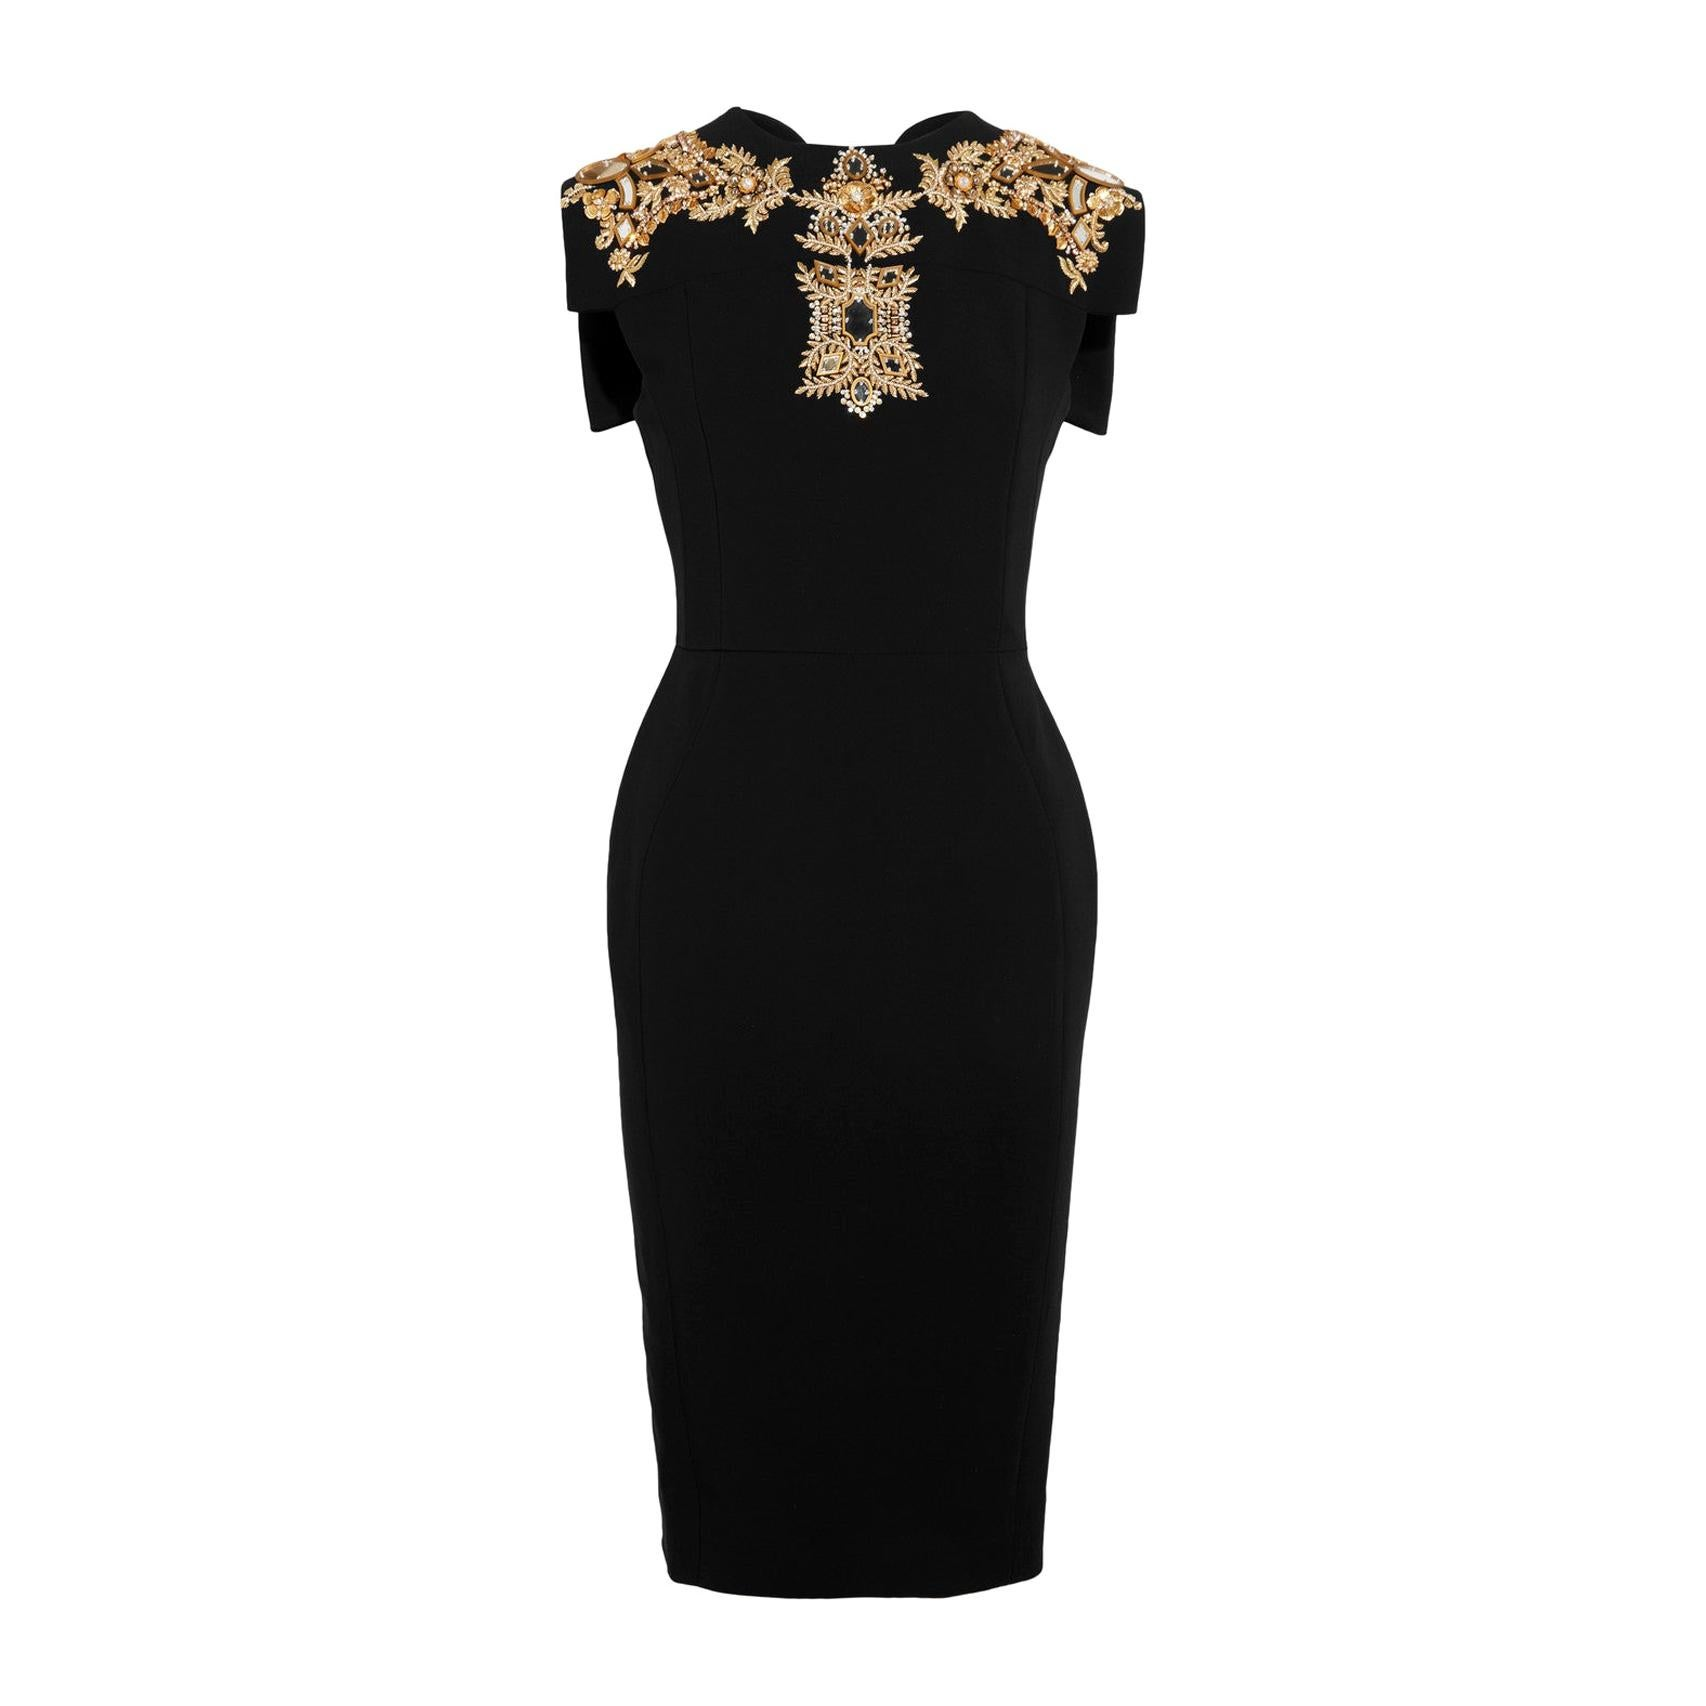 New ANTONIO BERARDI Mirror and Pearl Embroidery black stretch dress 42 - 6